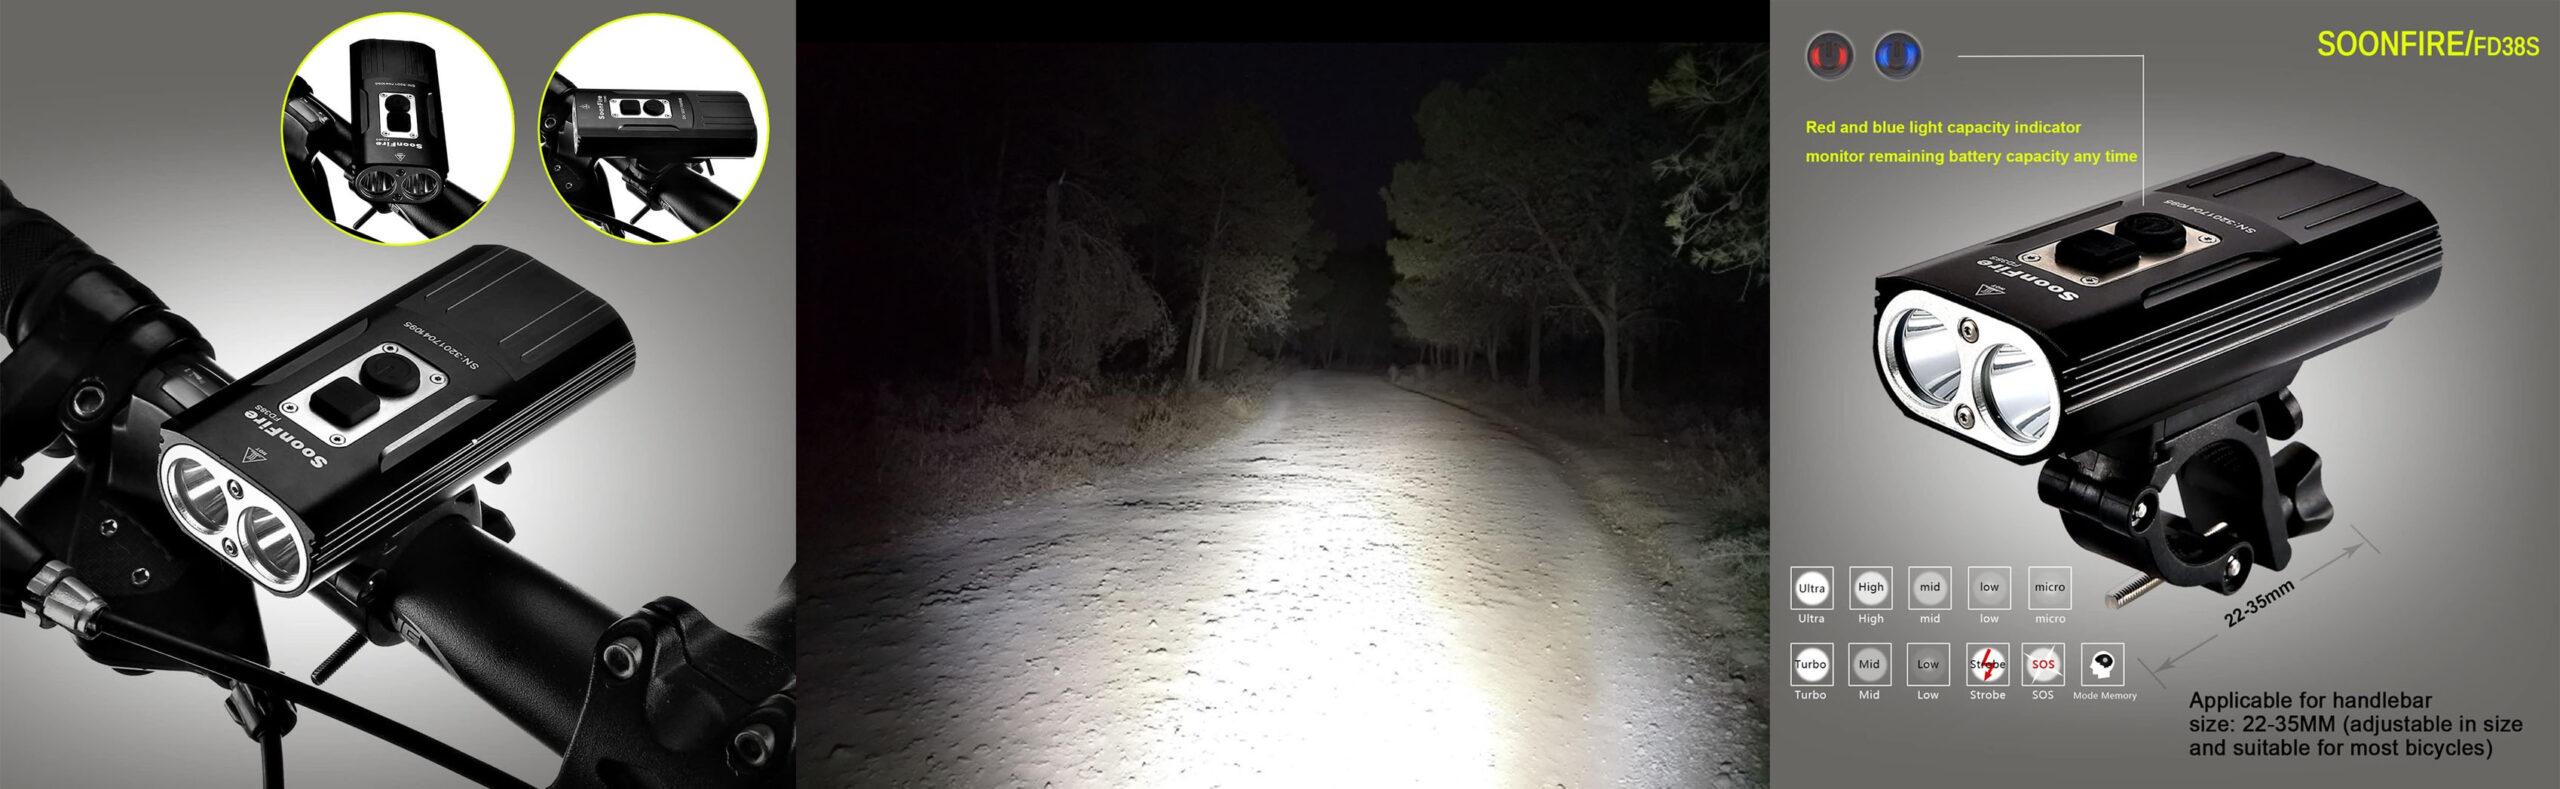 soonfire luz delantera bicicleta ciclismo